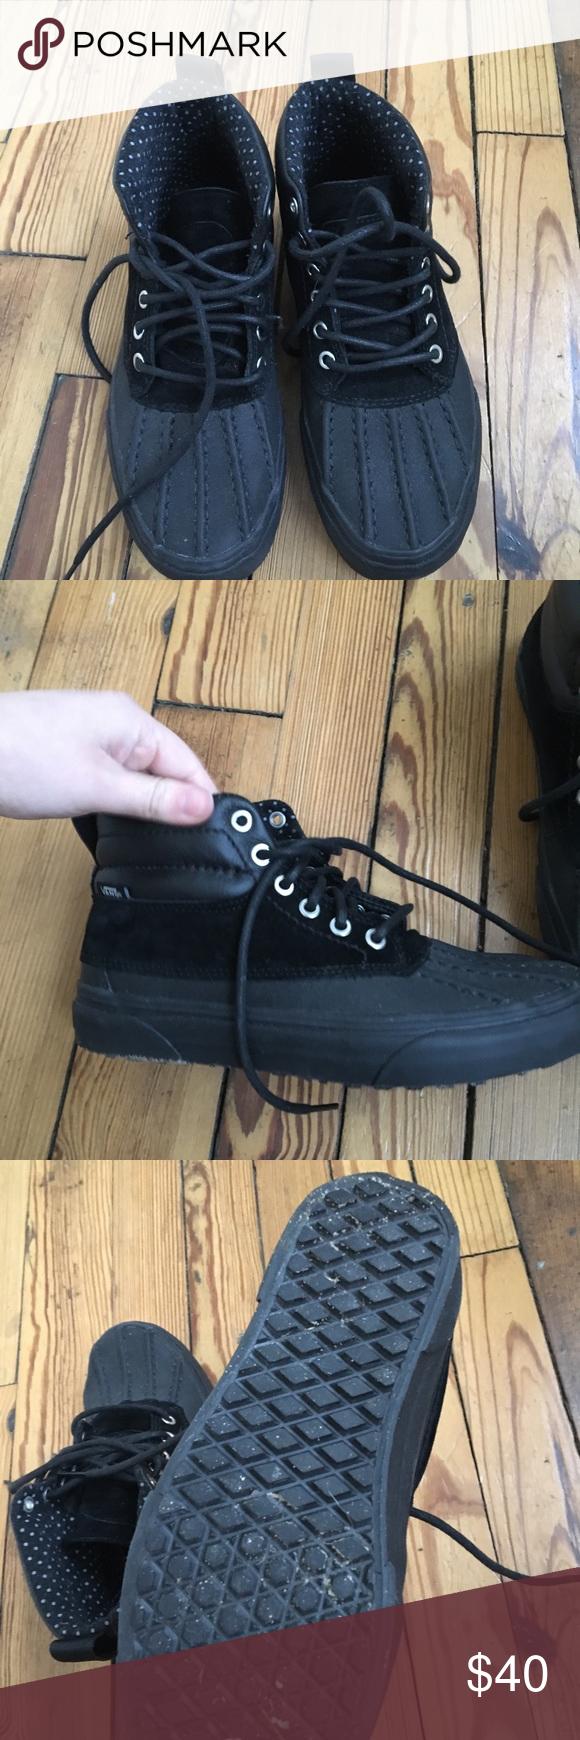 Platform sneakers, Vans